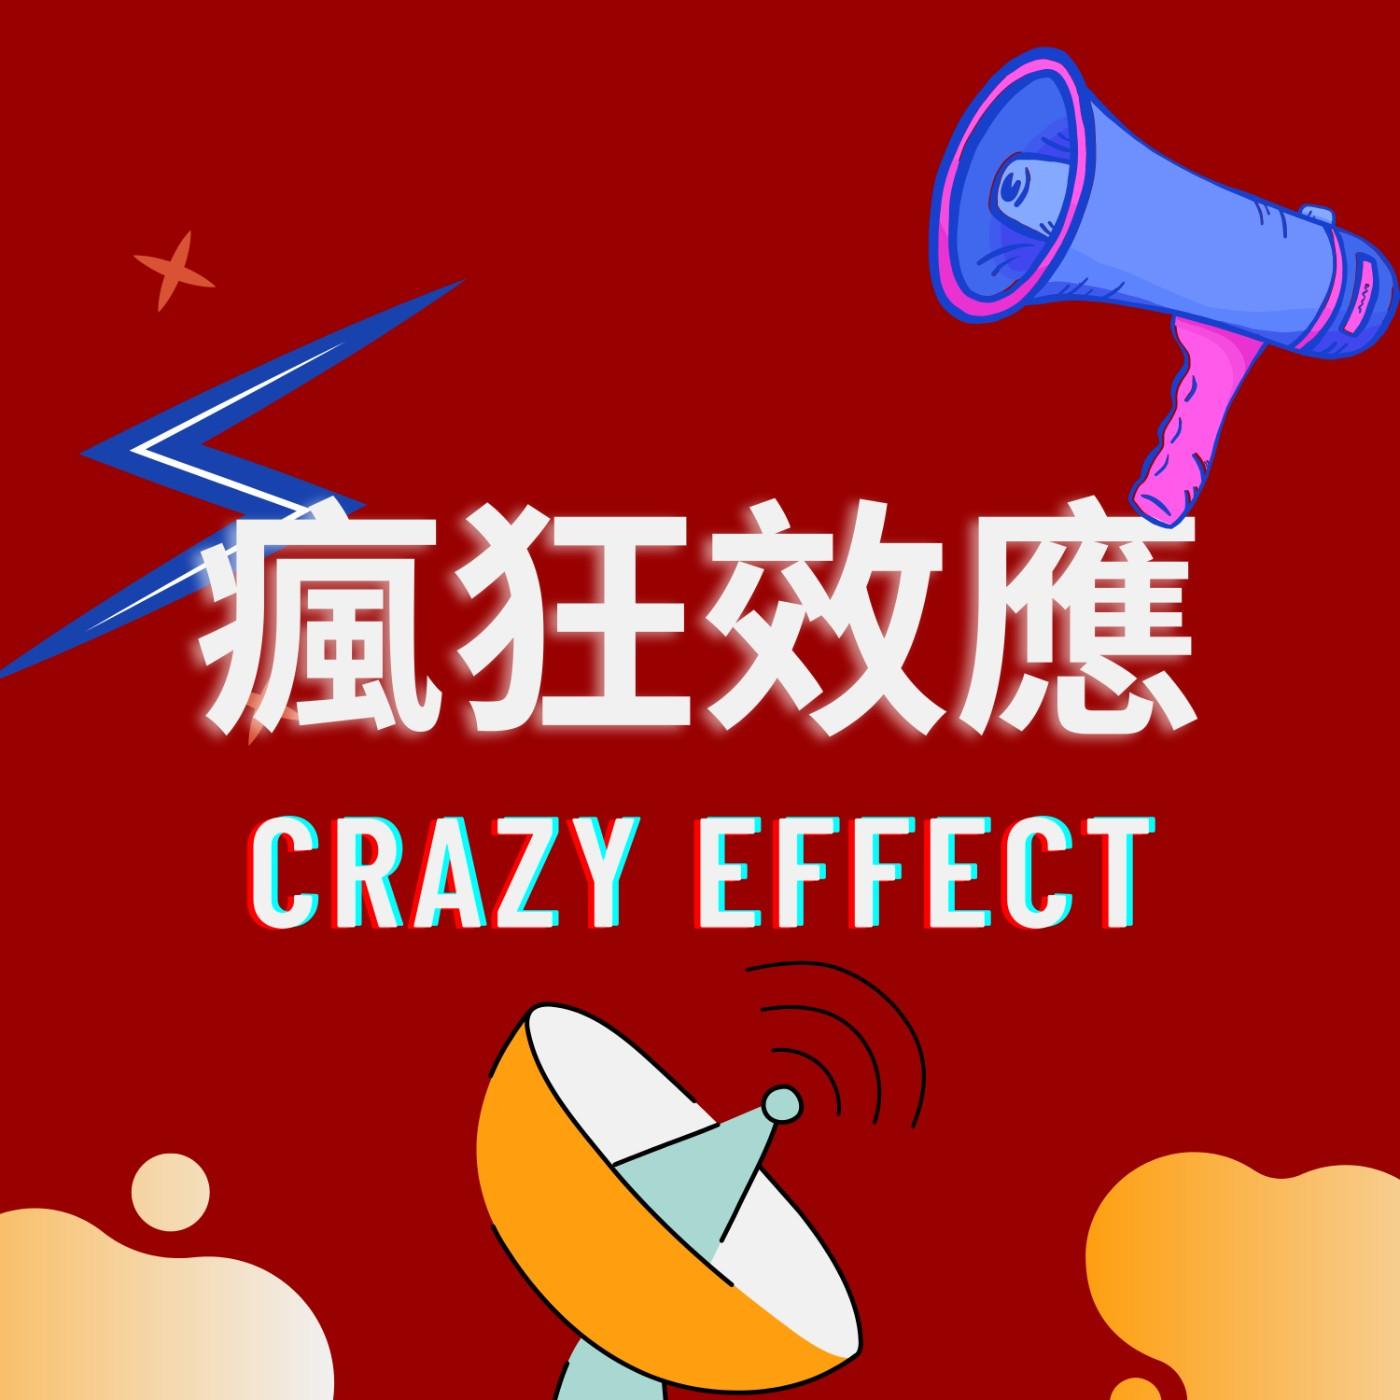 「Crazy news」連假趣事 ! 就是要吃肯德基、遺產萬萬稅、最佳死亡導覽員